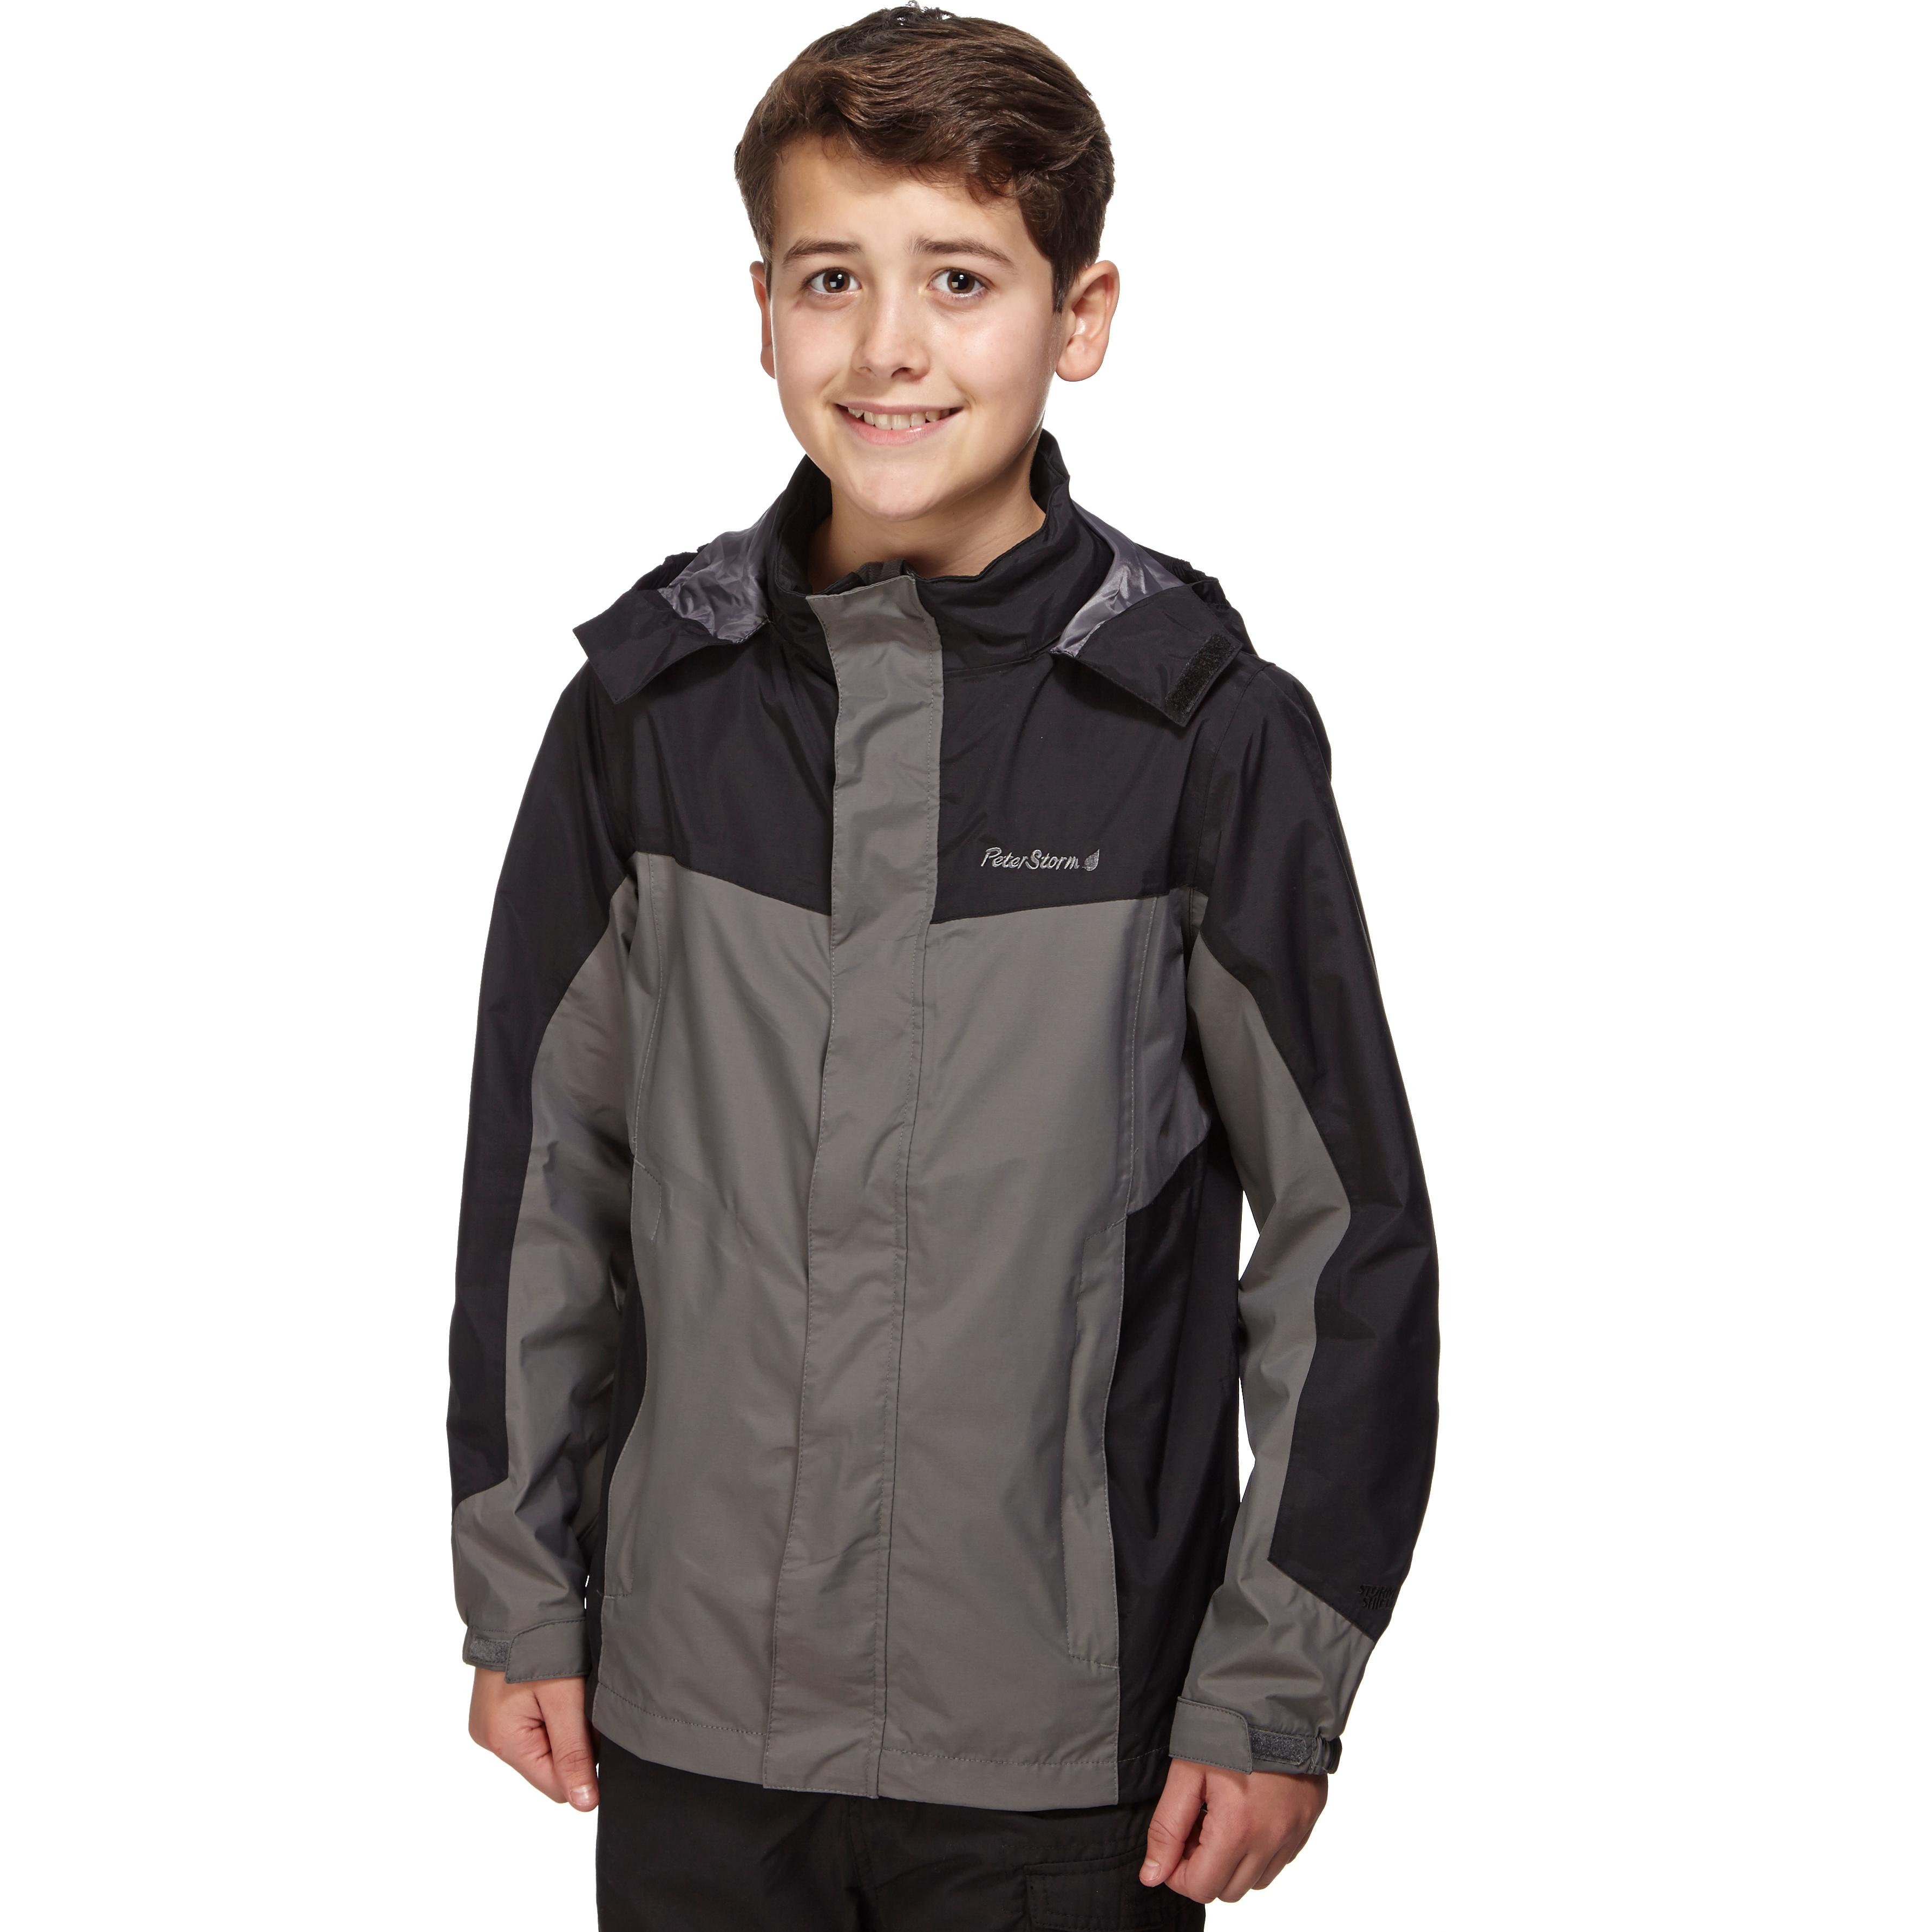 Result Childrens//Kids Reversible Storm Stuff Anti Pilling Fleece Waterproof Jacket